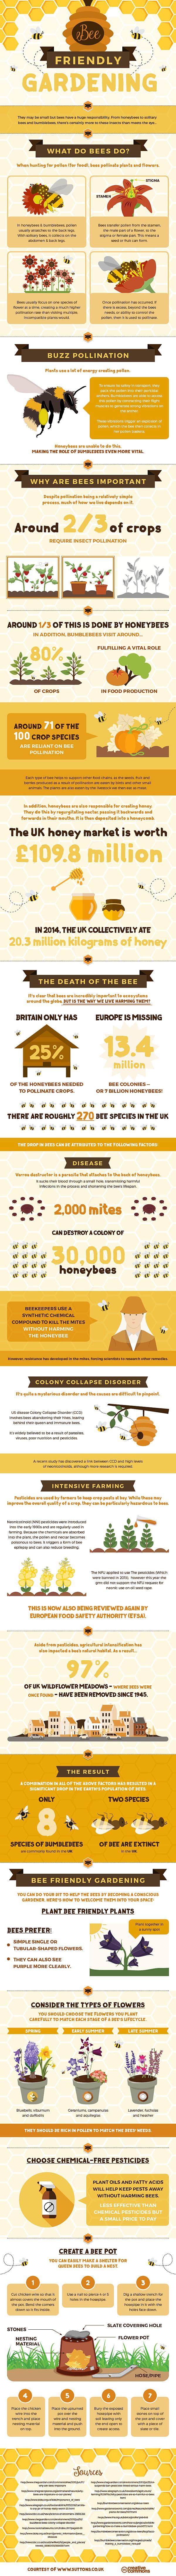 Bee friendly gardening graphics